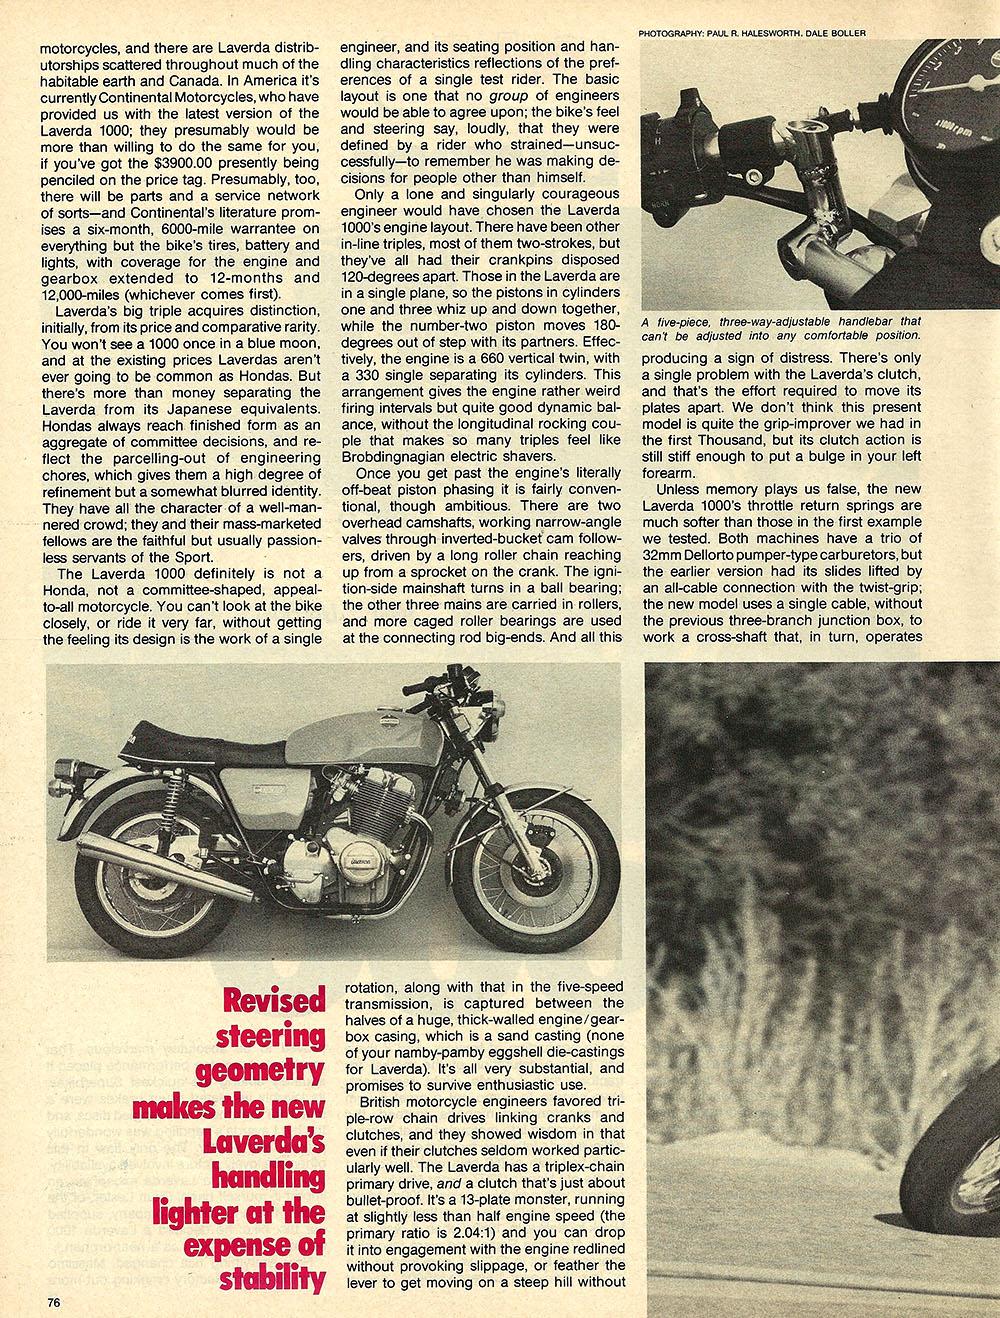 1976 Laverda 1000 road test 2.JPG